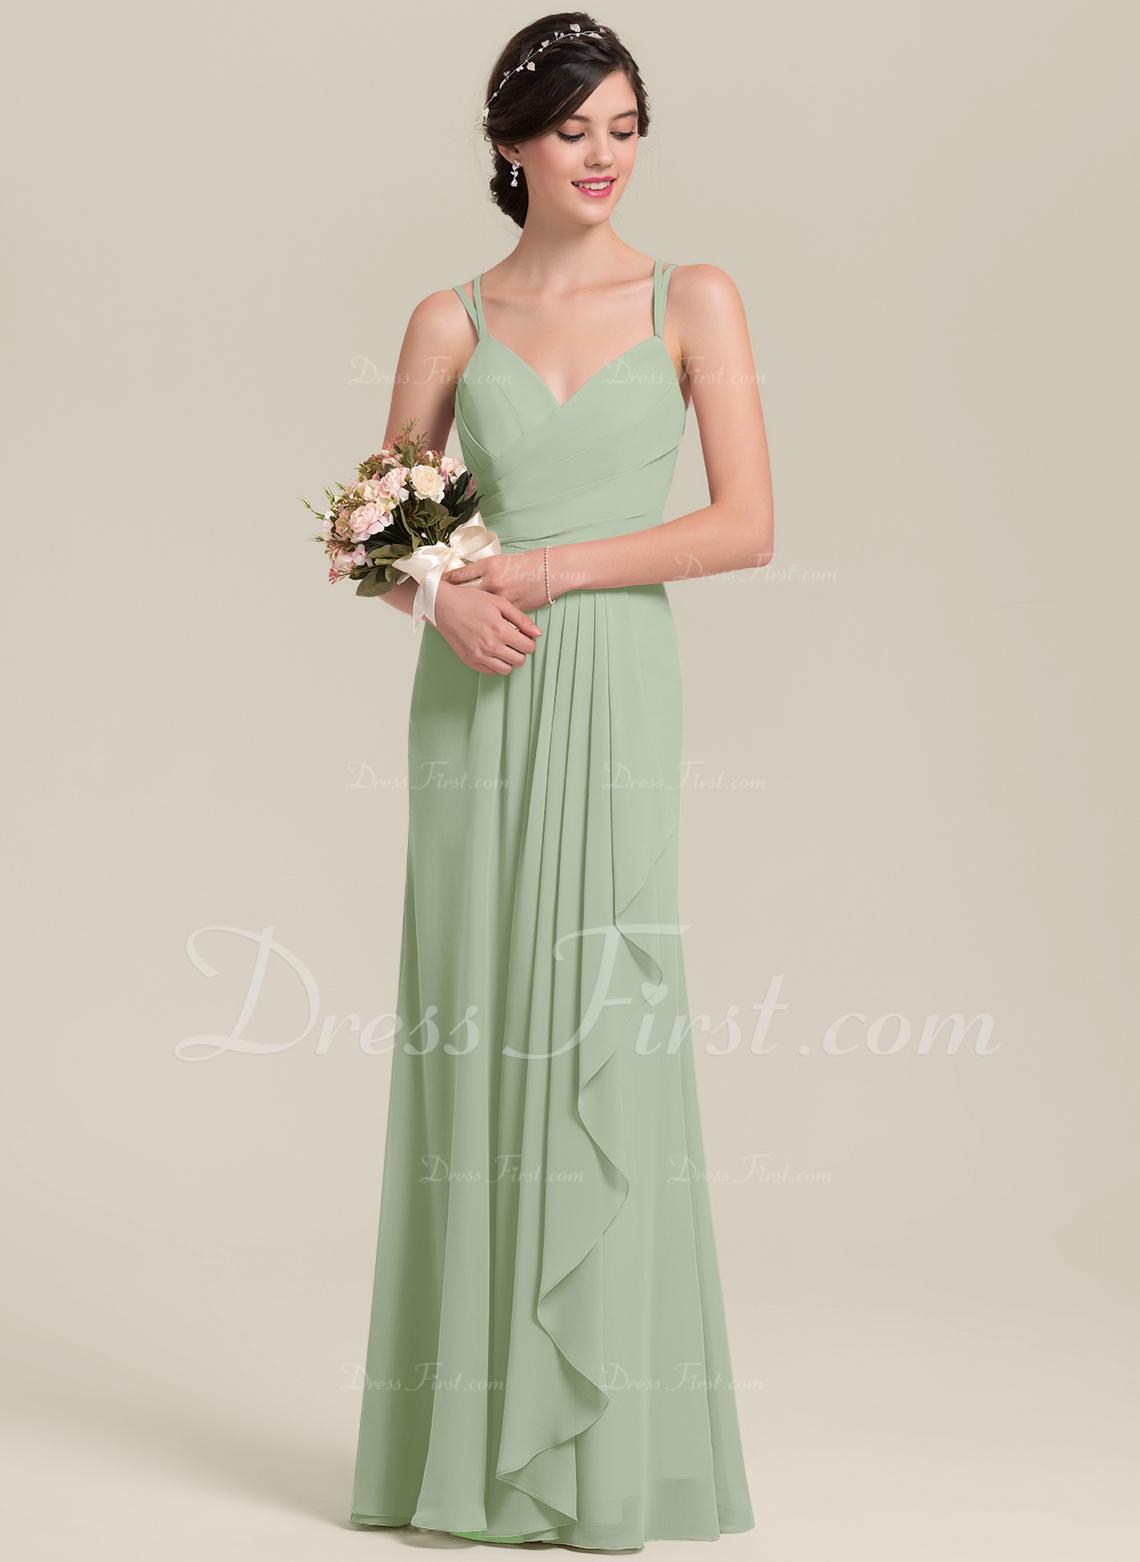 A-Line Sweetheart Floor-Length Chiffon Bridesmaid Dress With Cascading Ruffles